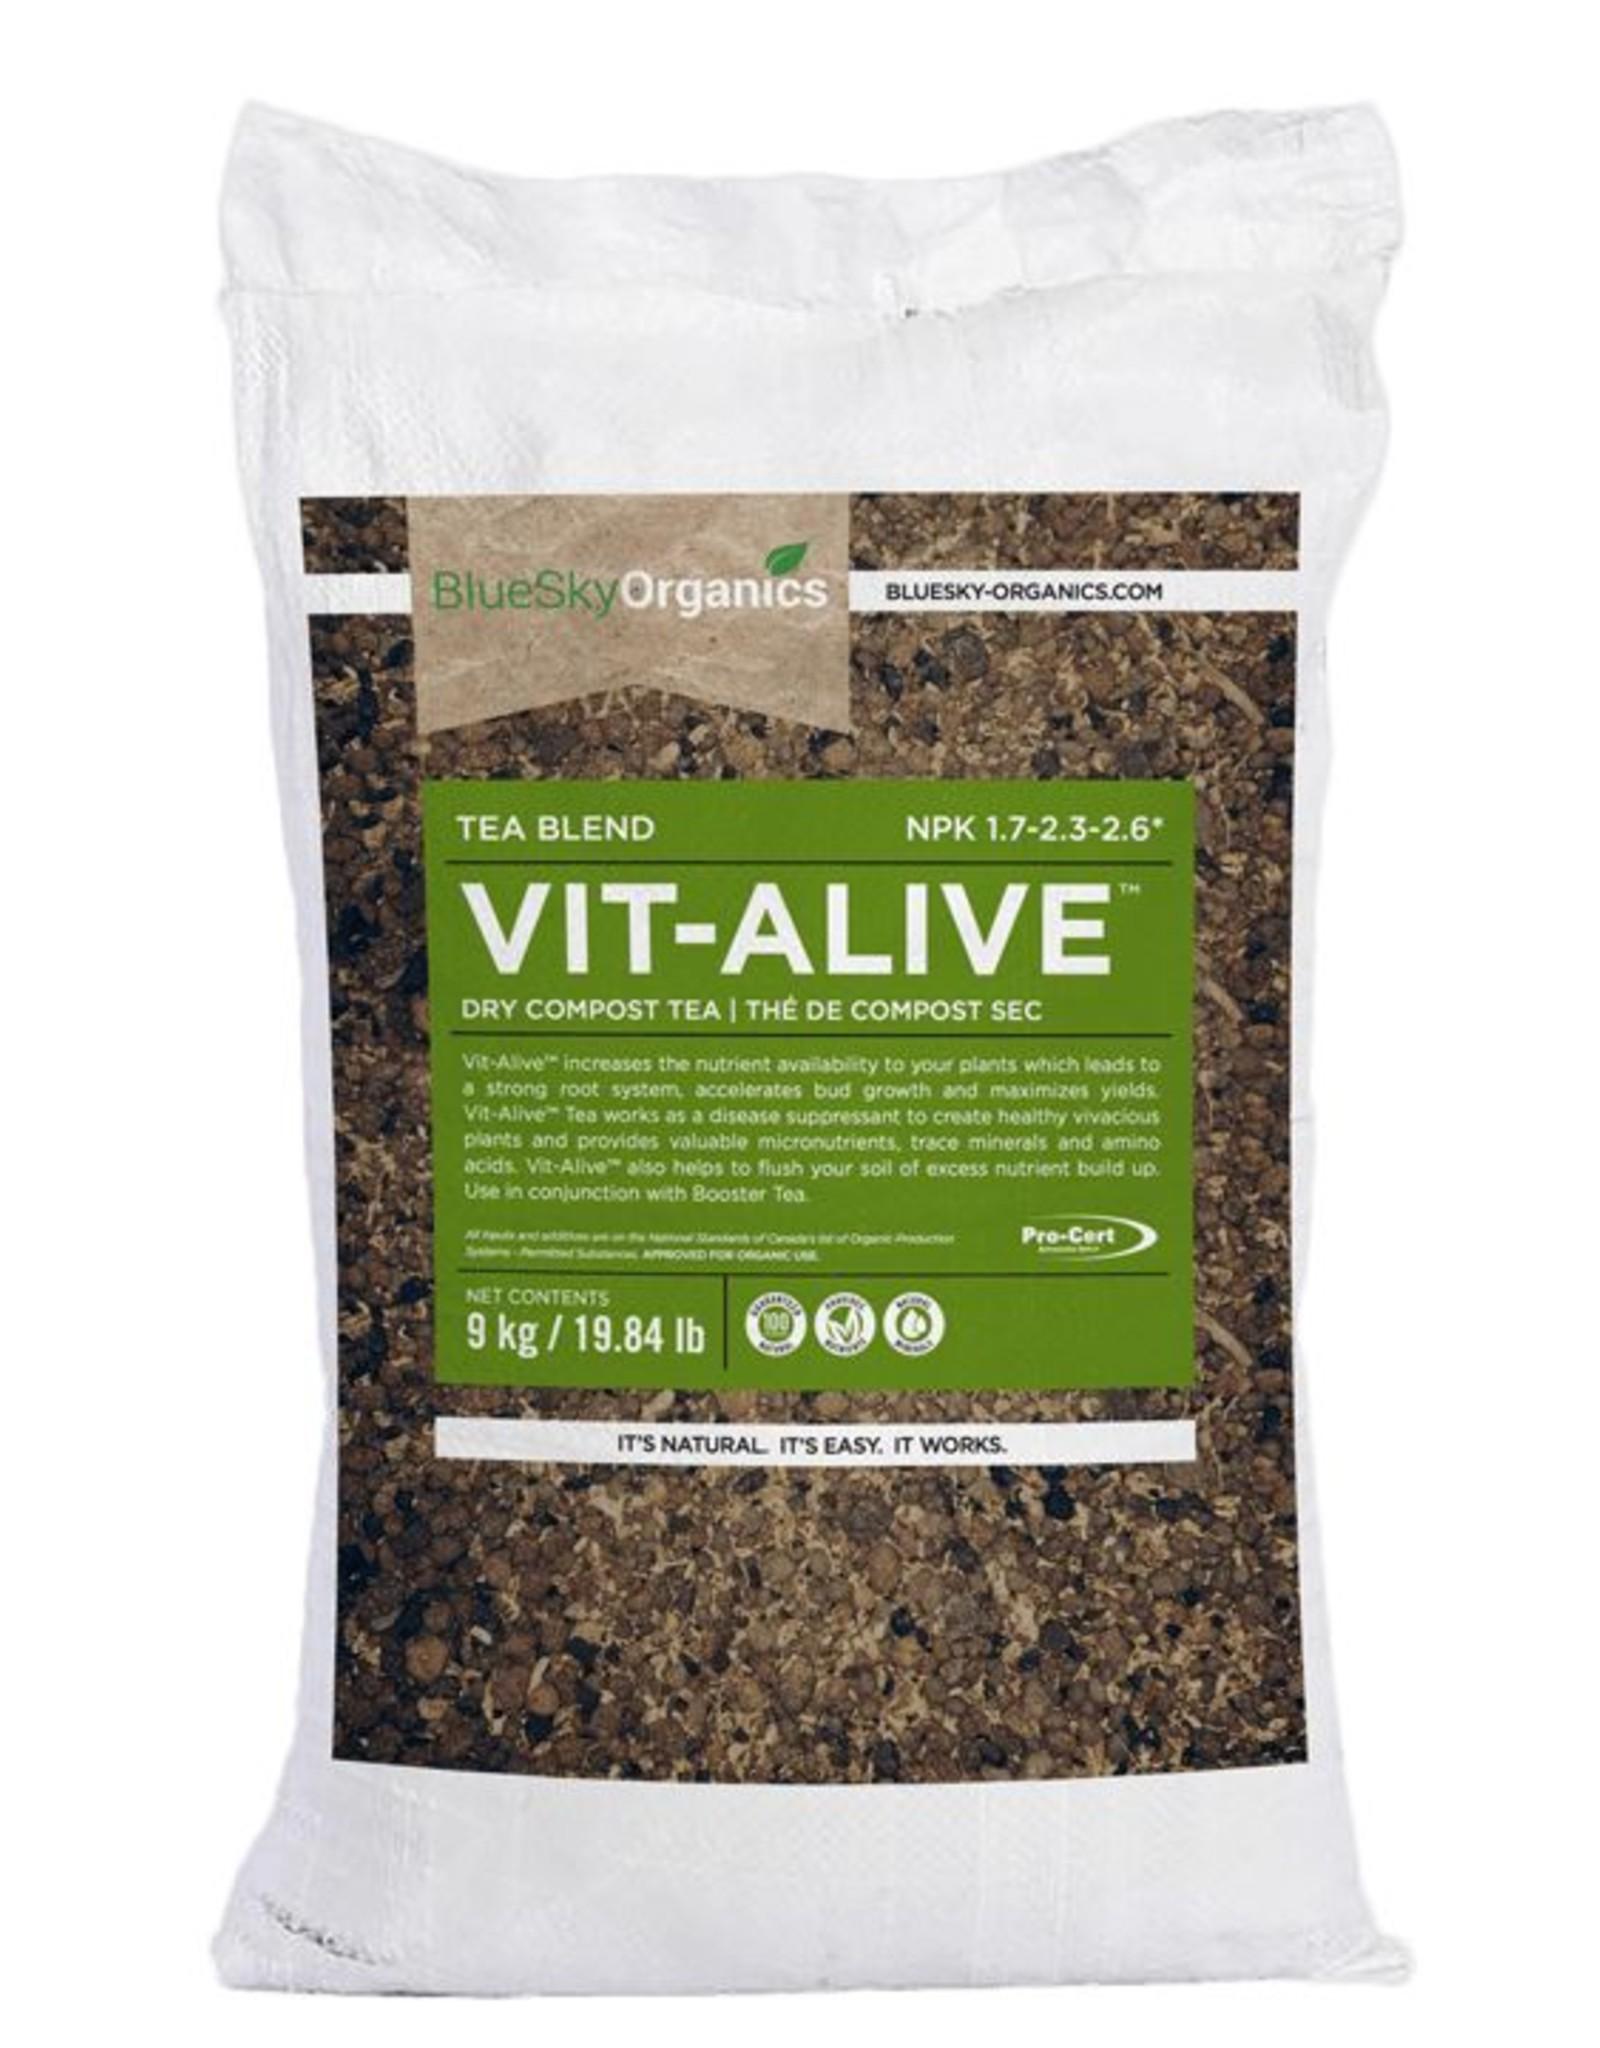 BlueSky Organics Vit-Alive 9Kg